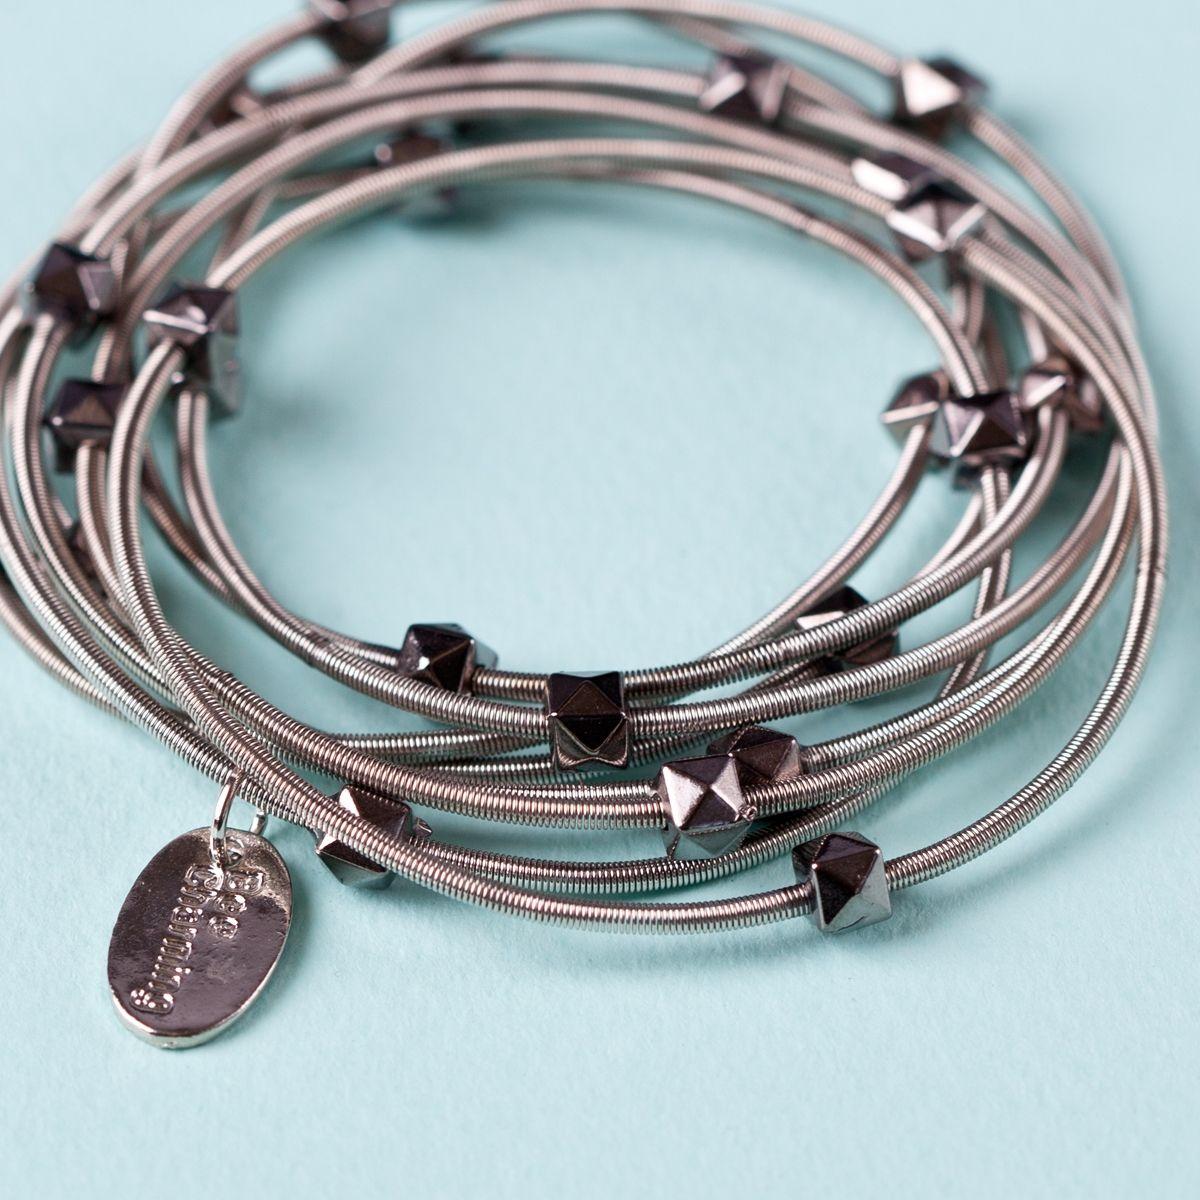 Recycled guitar string jewelry - Piano Wire Jewelry